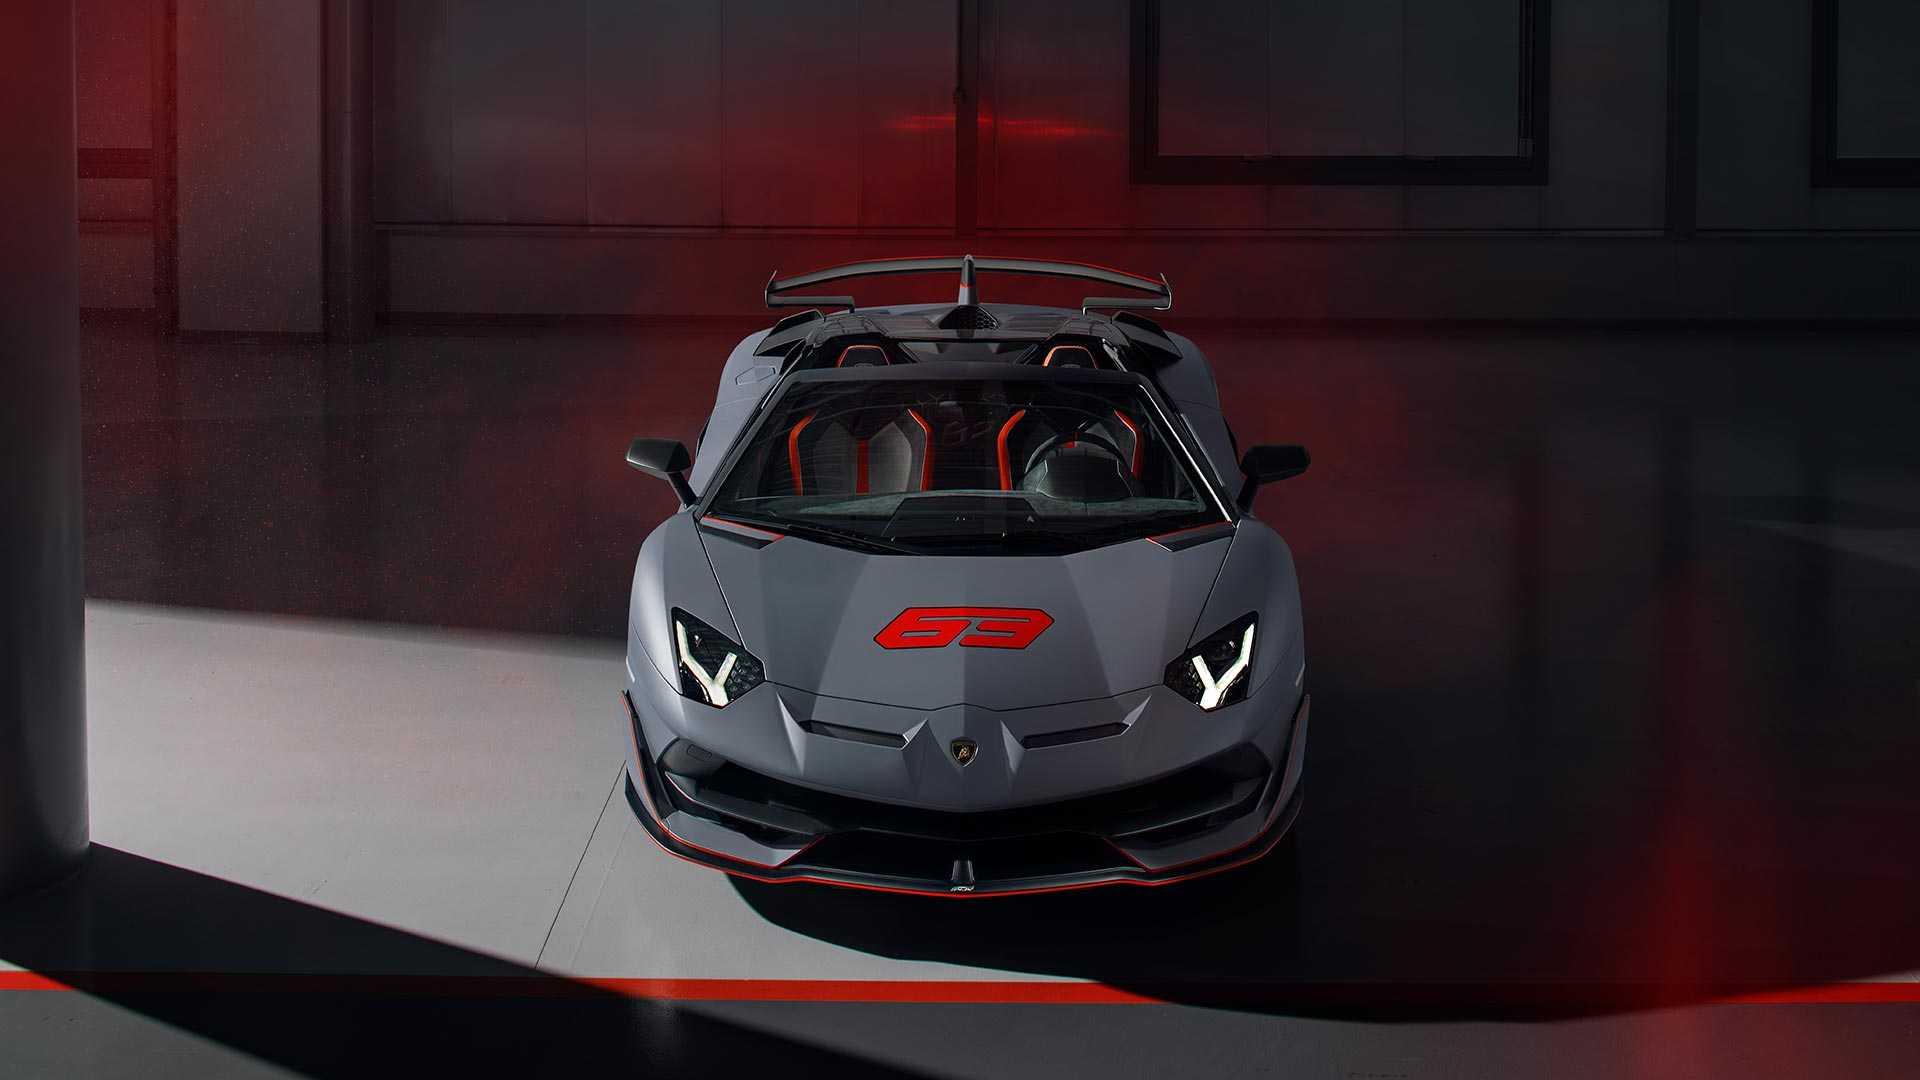 2020 Lamborghini Aventador SVJ 63 Roadster Front Wallpapers (2)